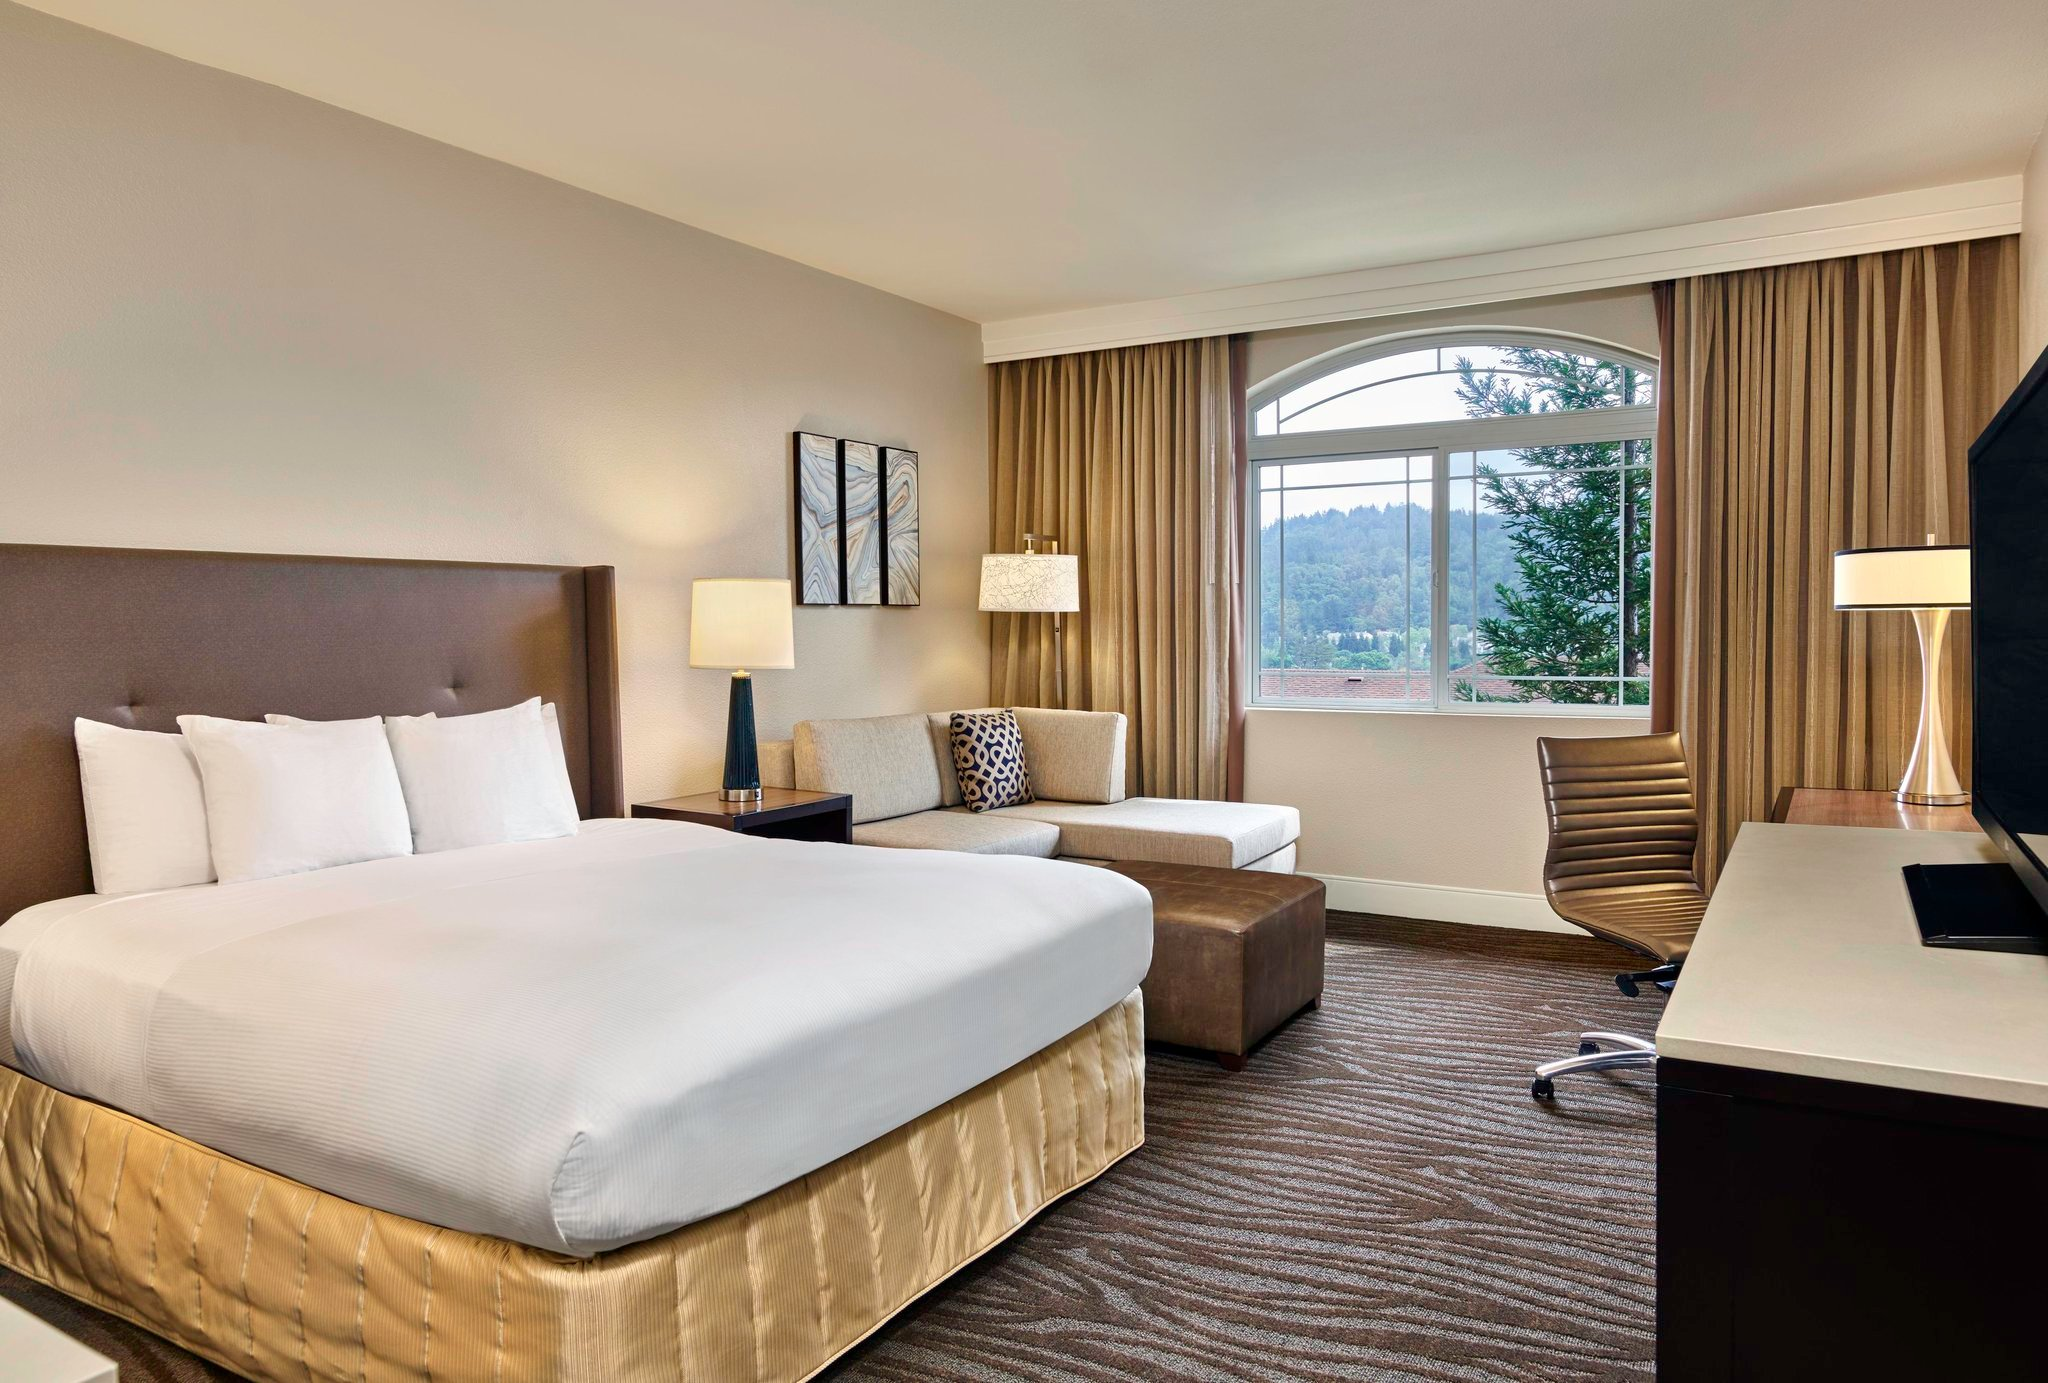 Hilton Santa Cruz / Scotts Valley